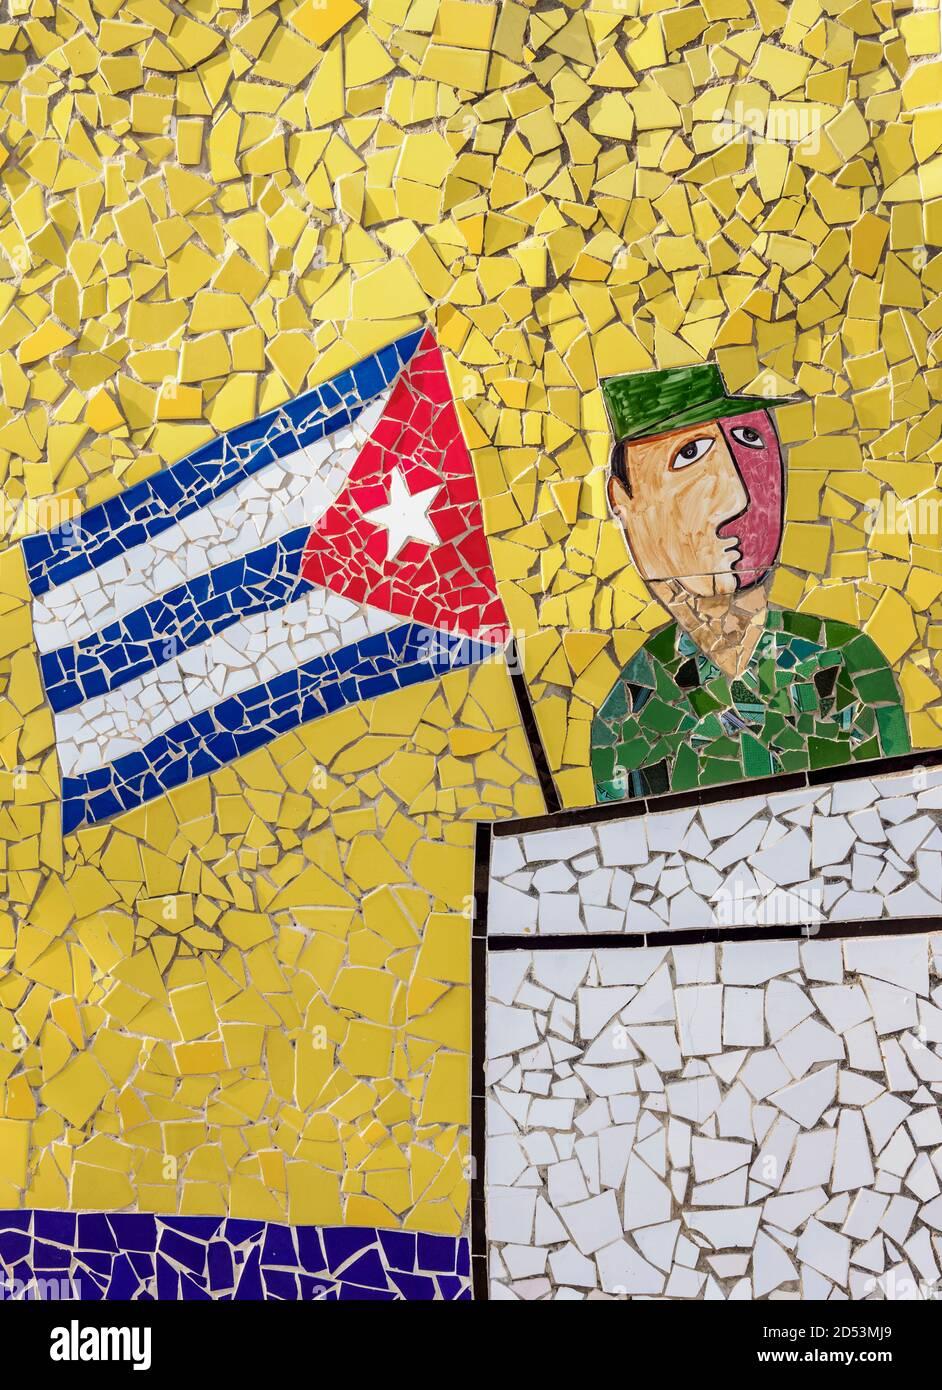 Fusterlandia, Jaimanitas Neighbourhood, Playa District, Havana, La Habana Province, Cuba Stock Photo